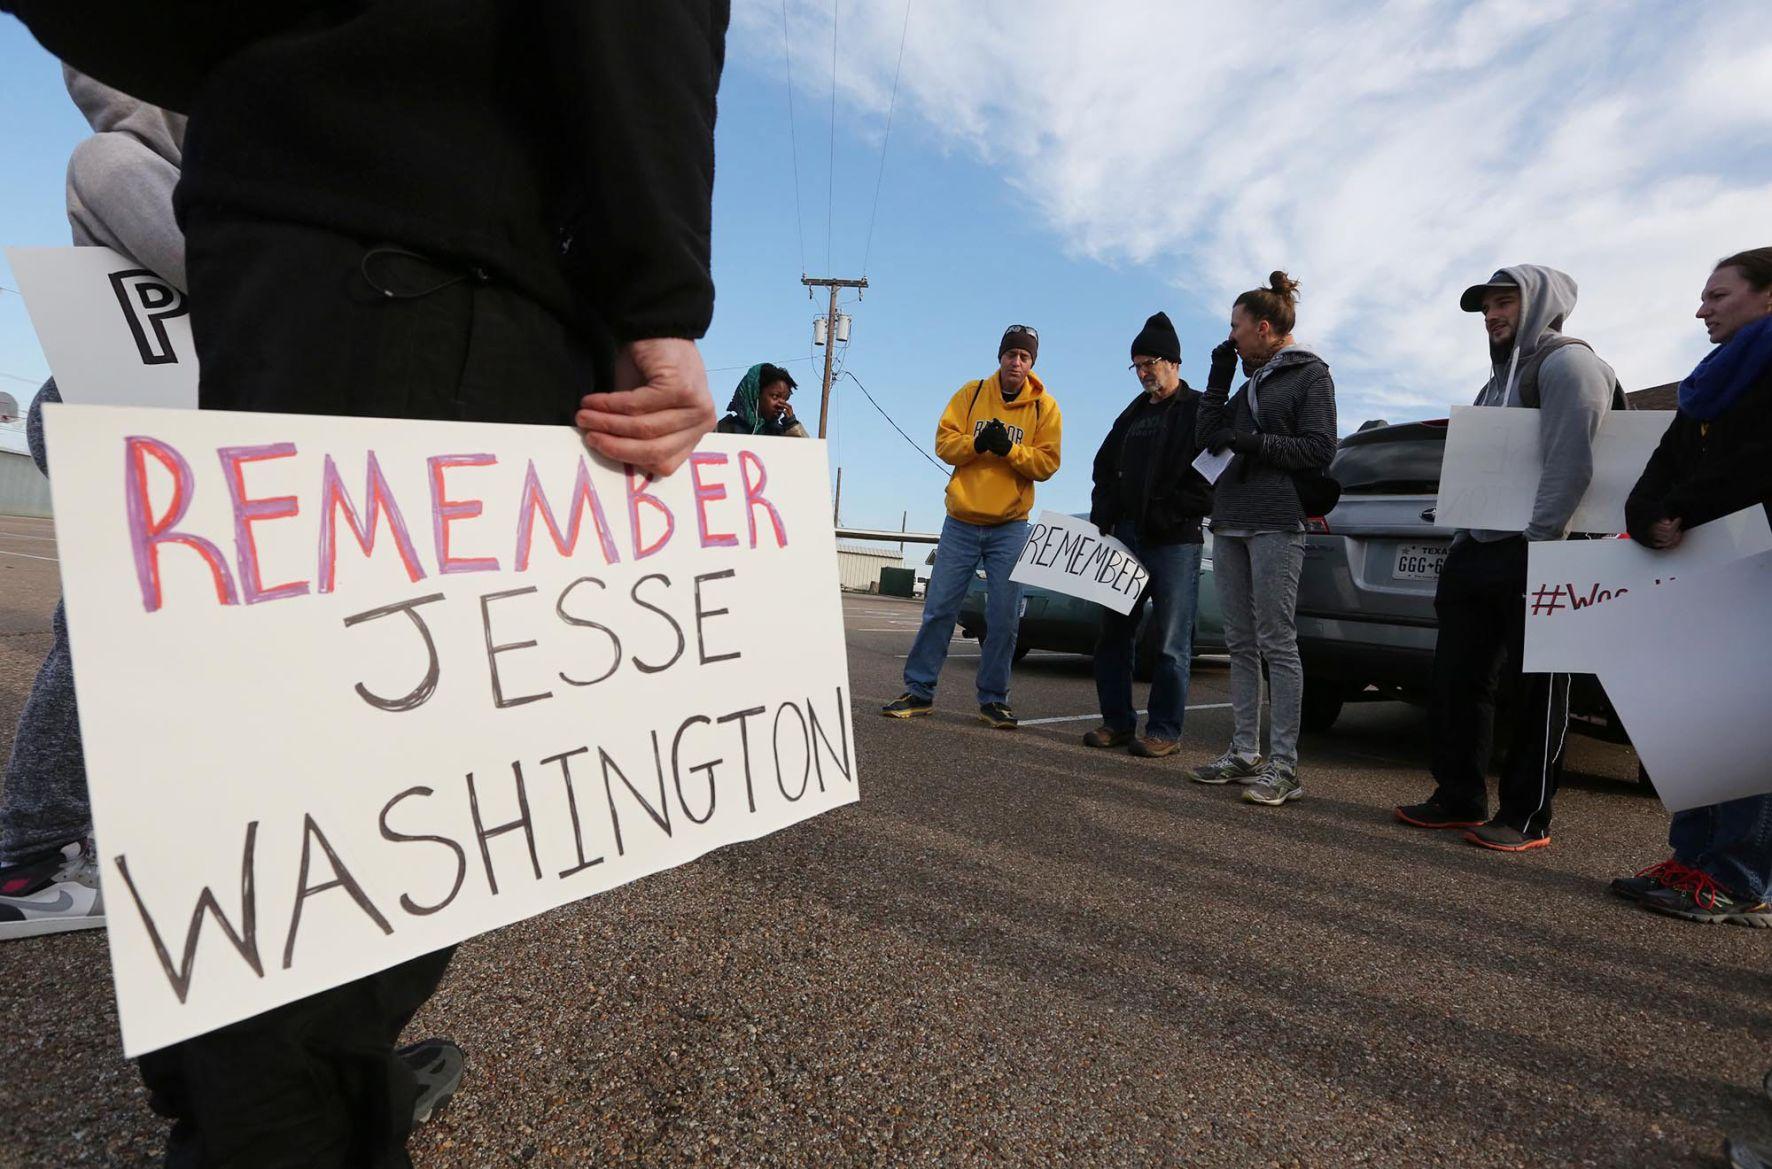 Jesse Washington march photo